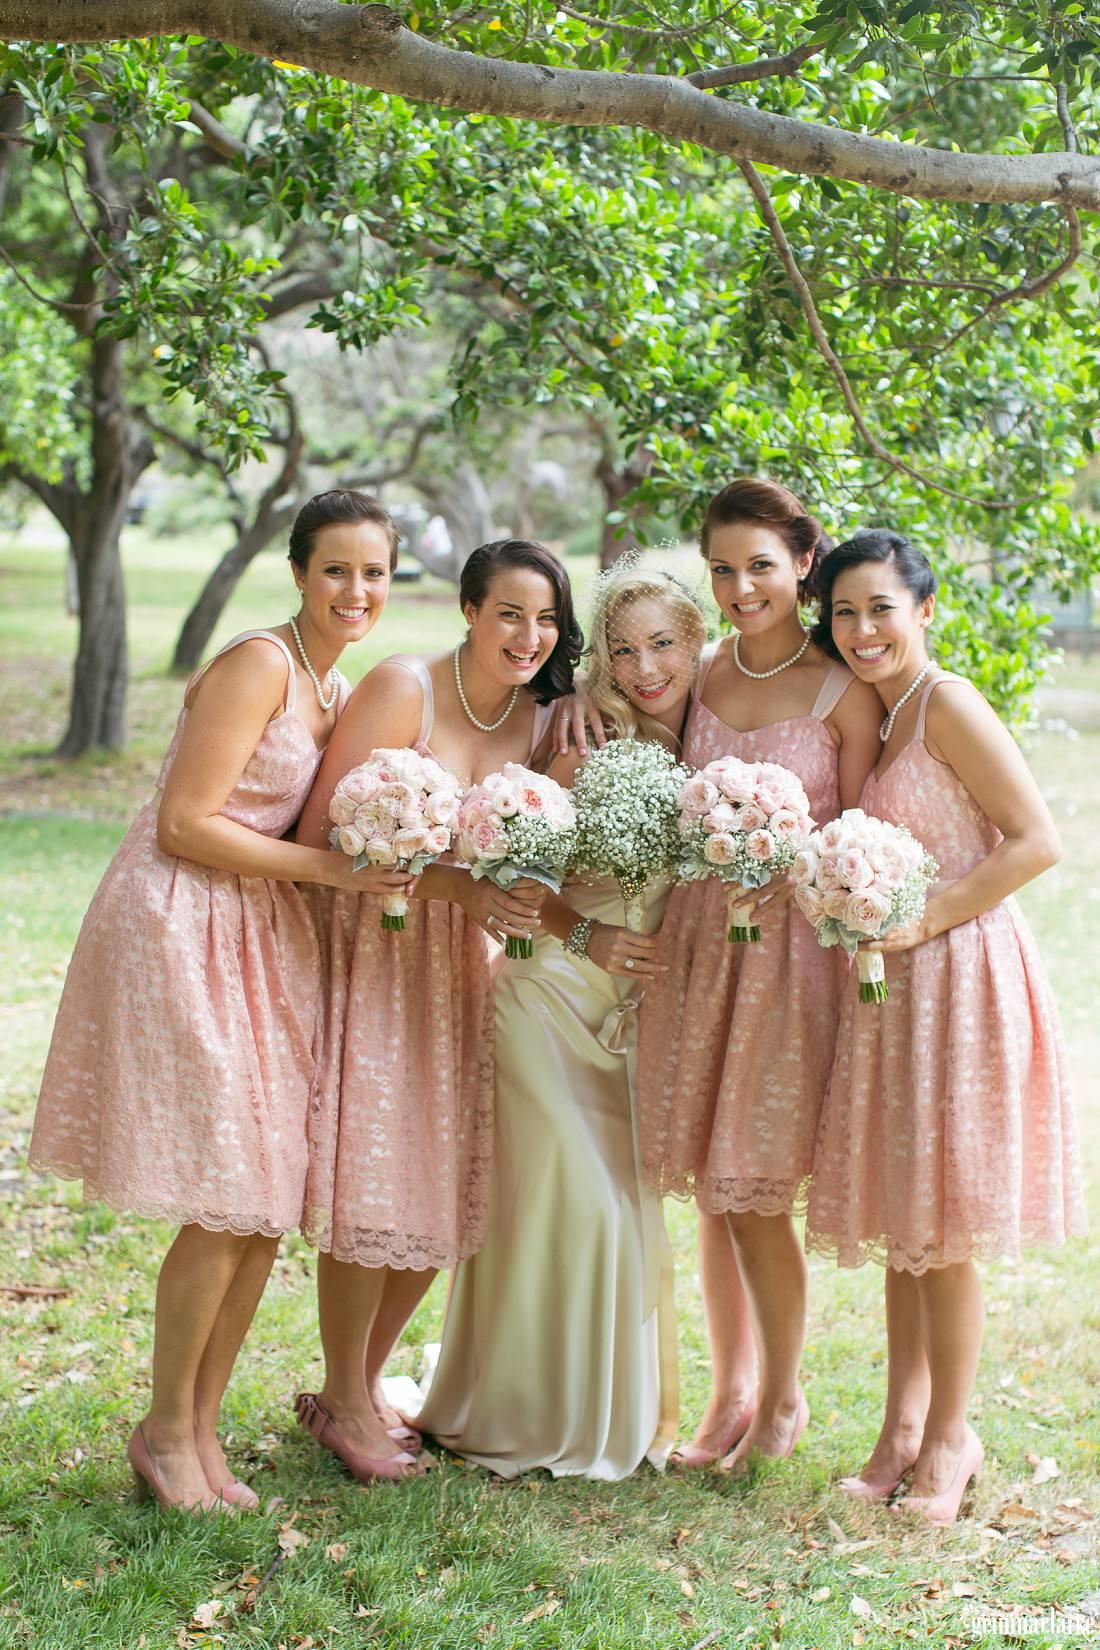 gemma-clarke-photography_watsons-bay-wedding_dog-bridesmaid_kristyl-and-ben_0061